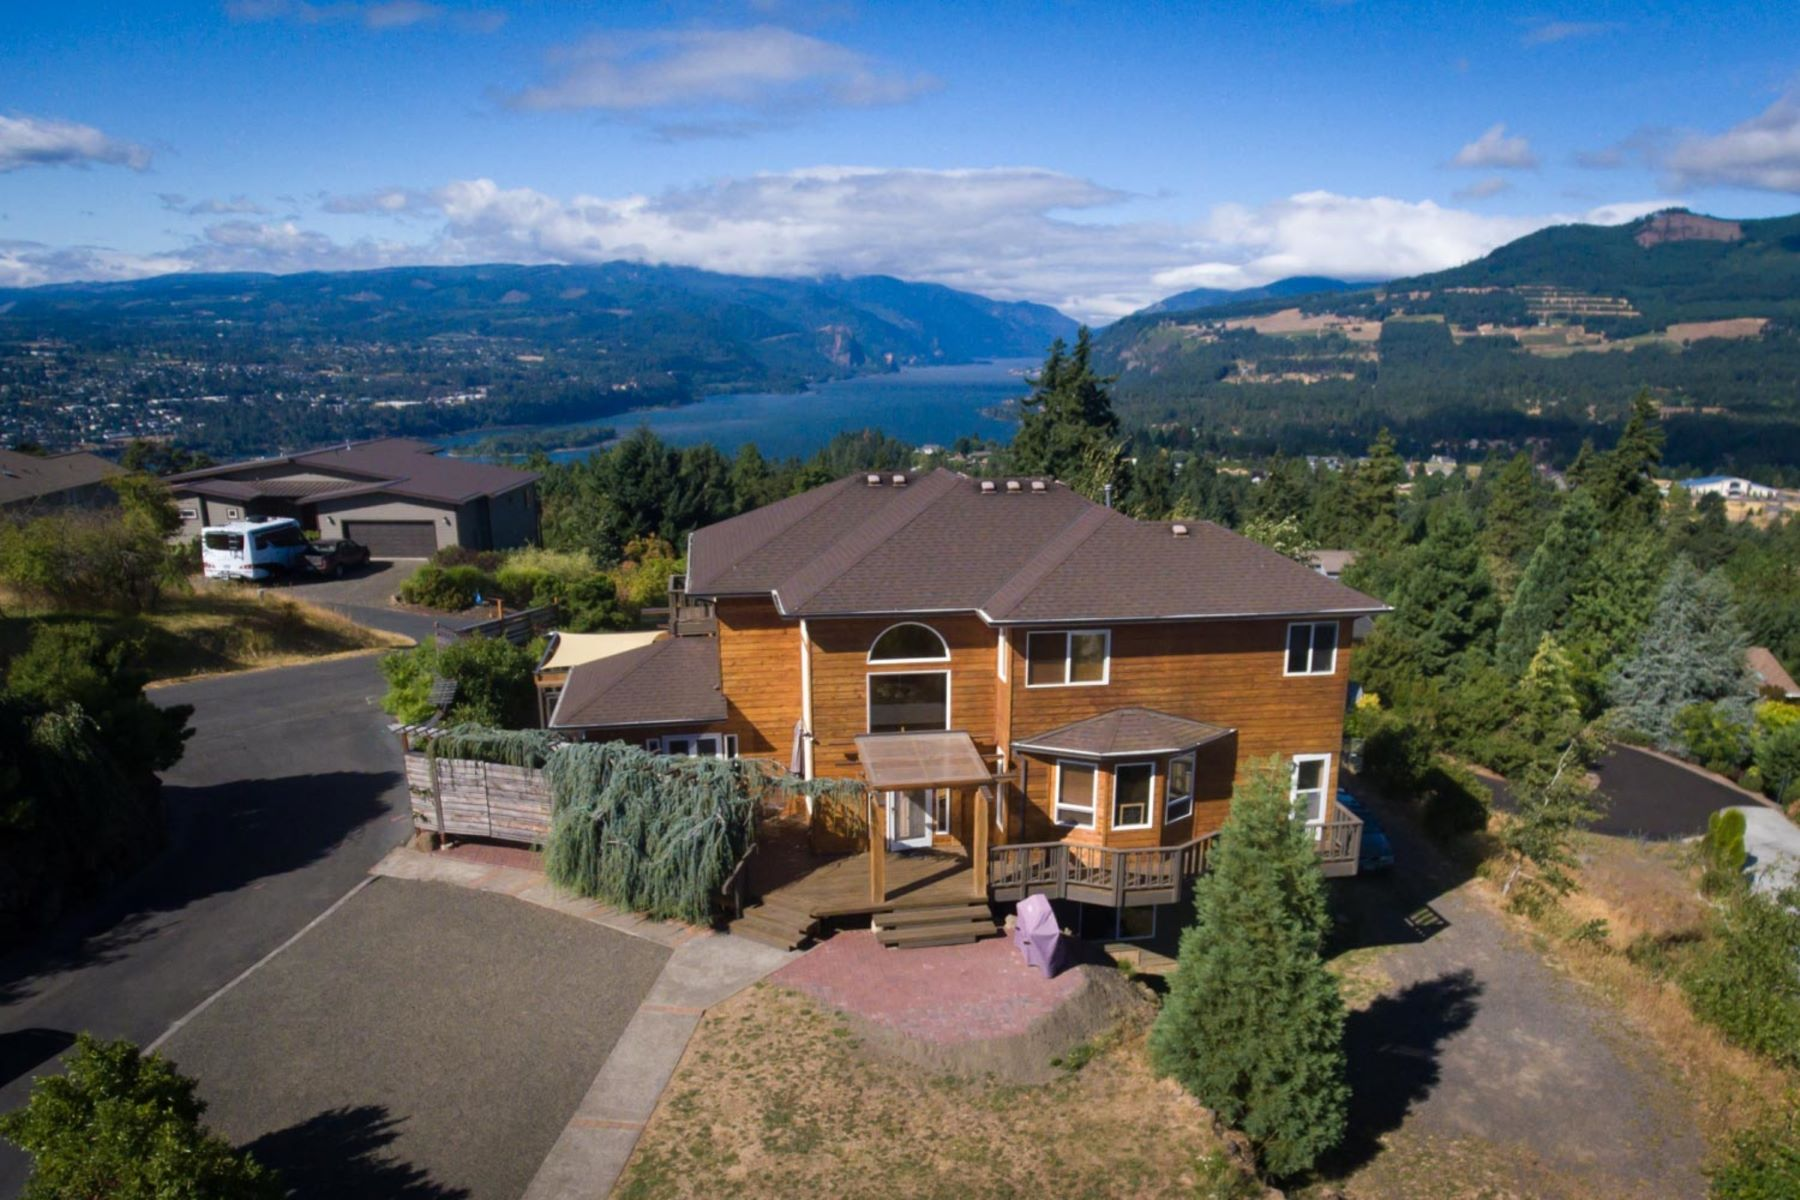 Single Family Homes for Sale at 420 El Camino Real 450 El Camino Real White Salmon, Washington 98672 United States